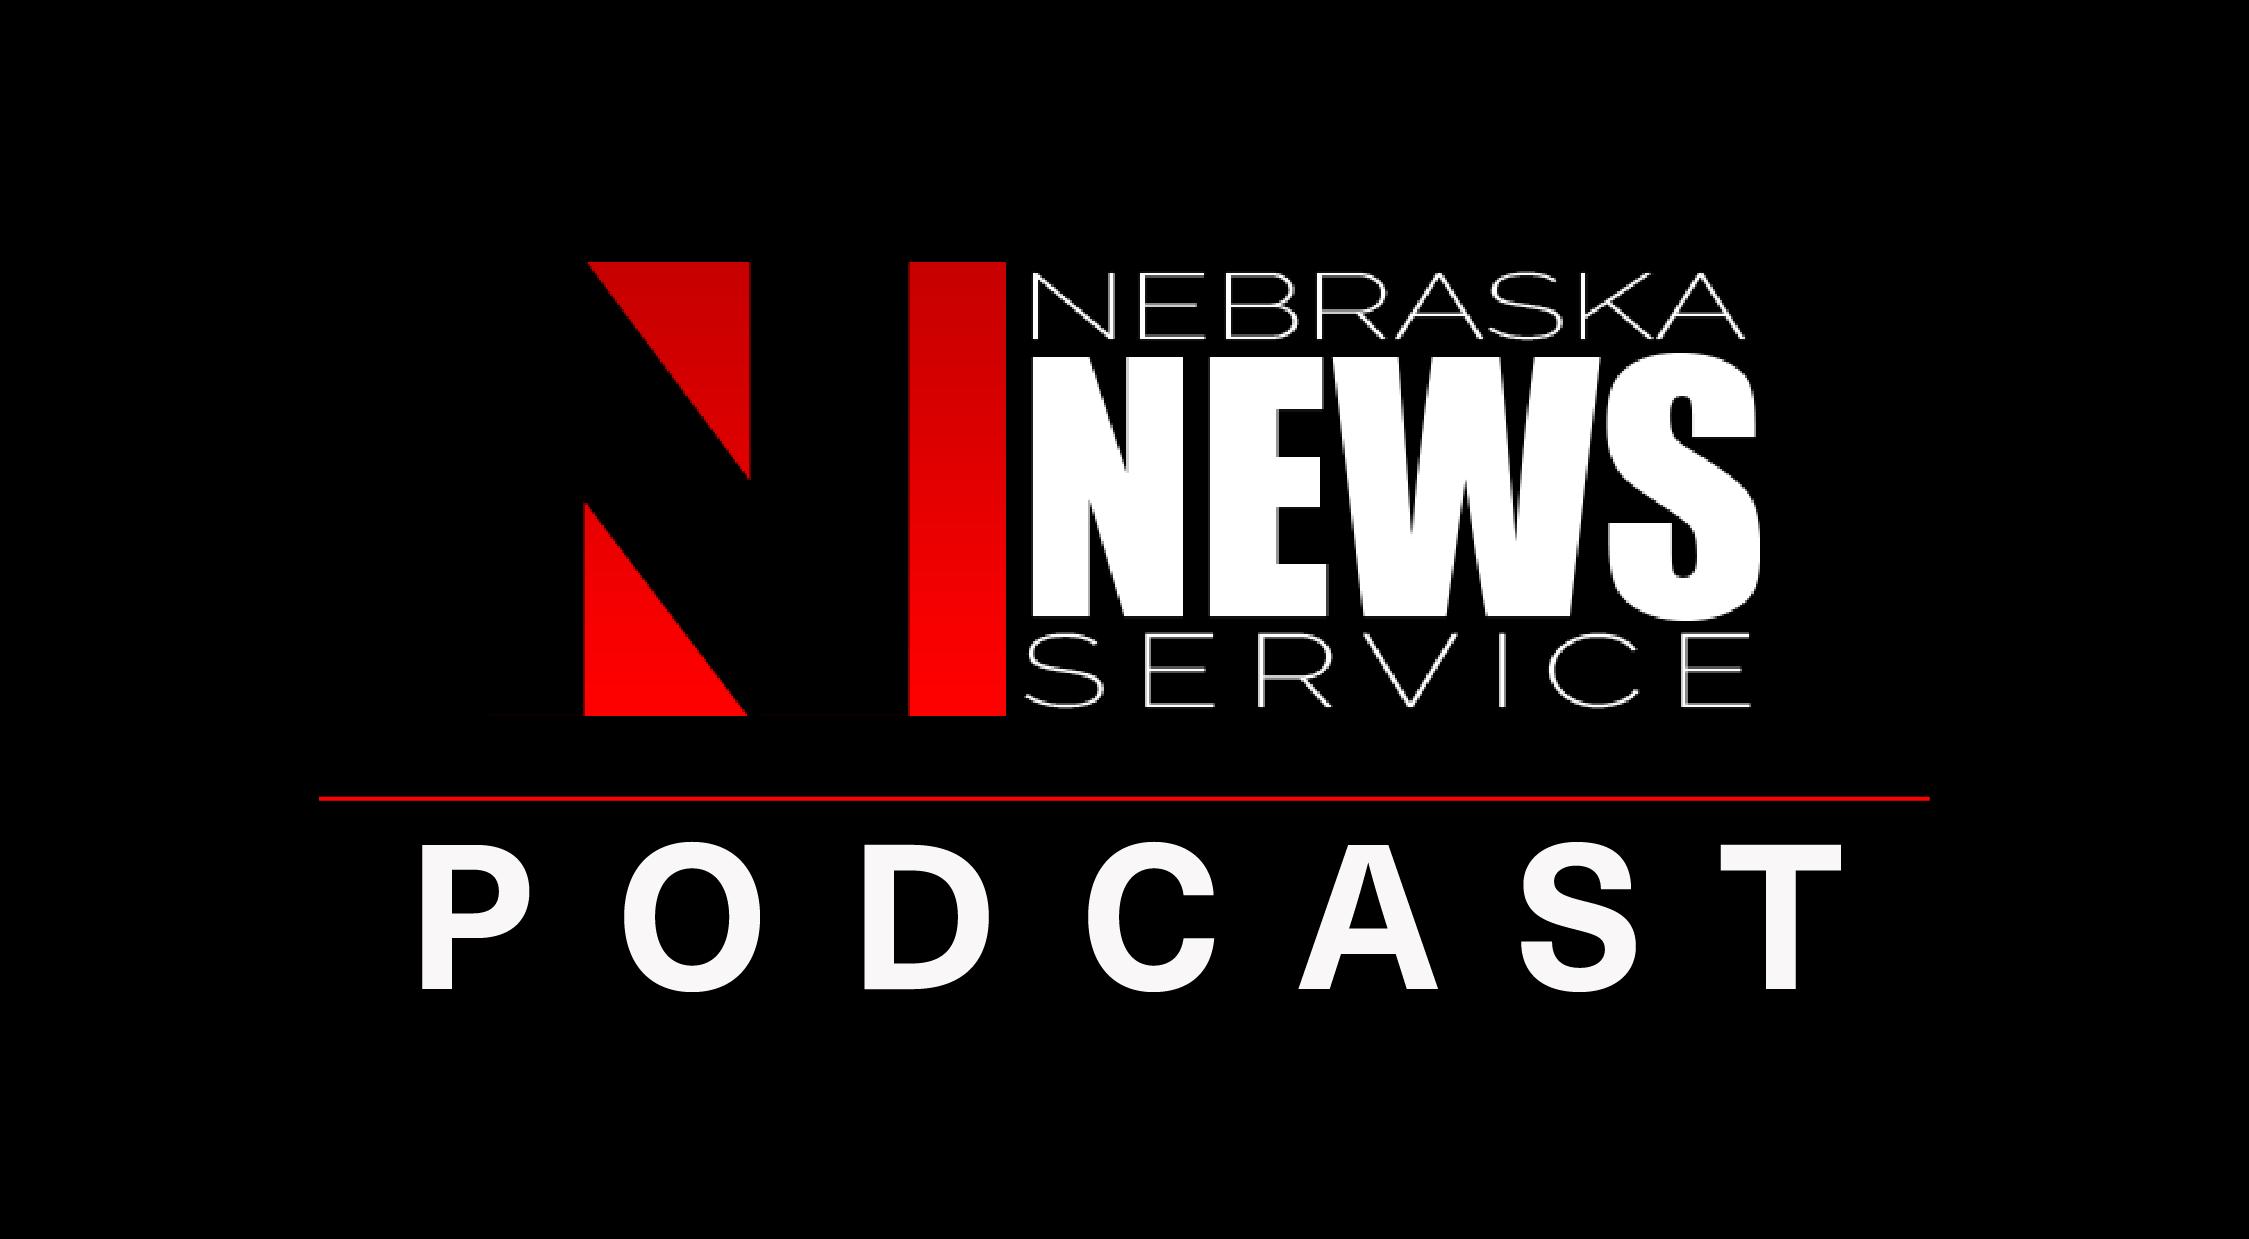 Nebraska News Service Podcast logo